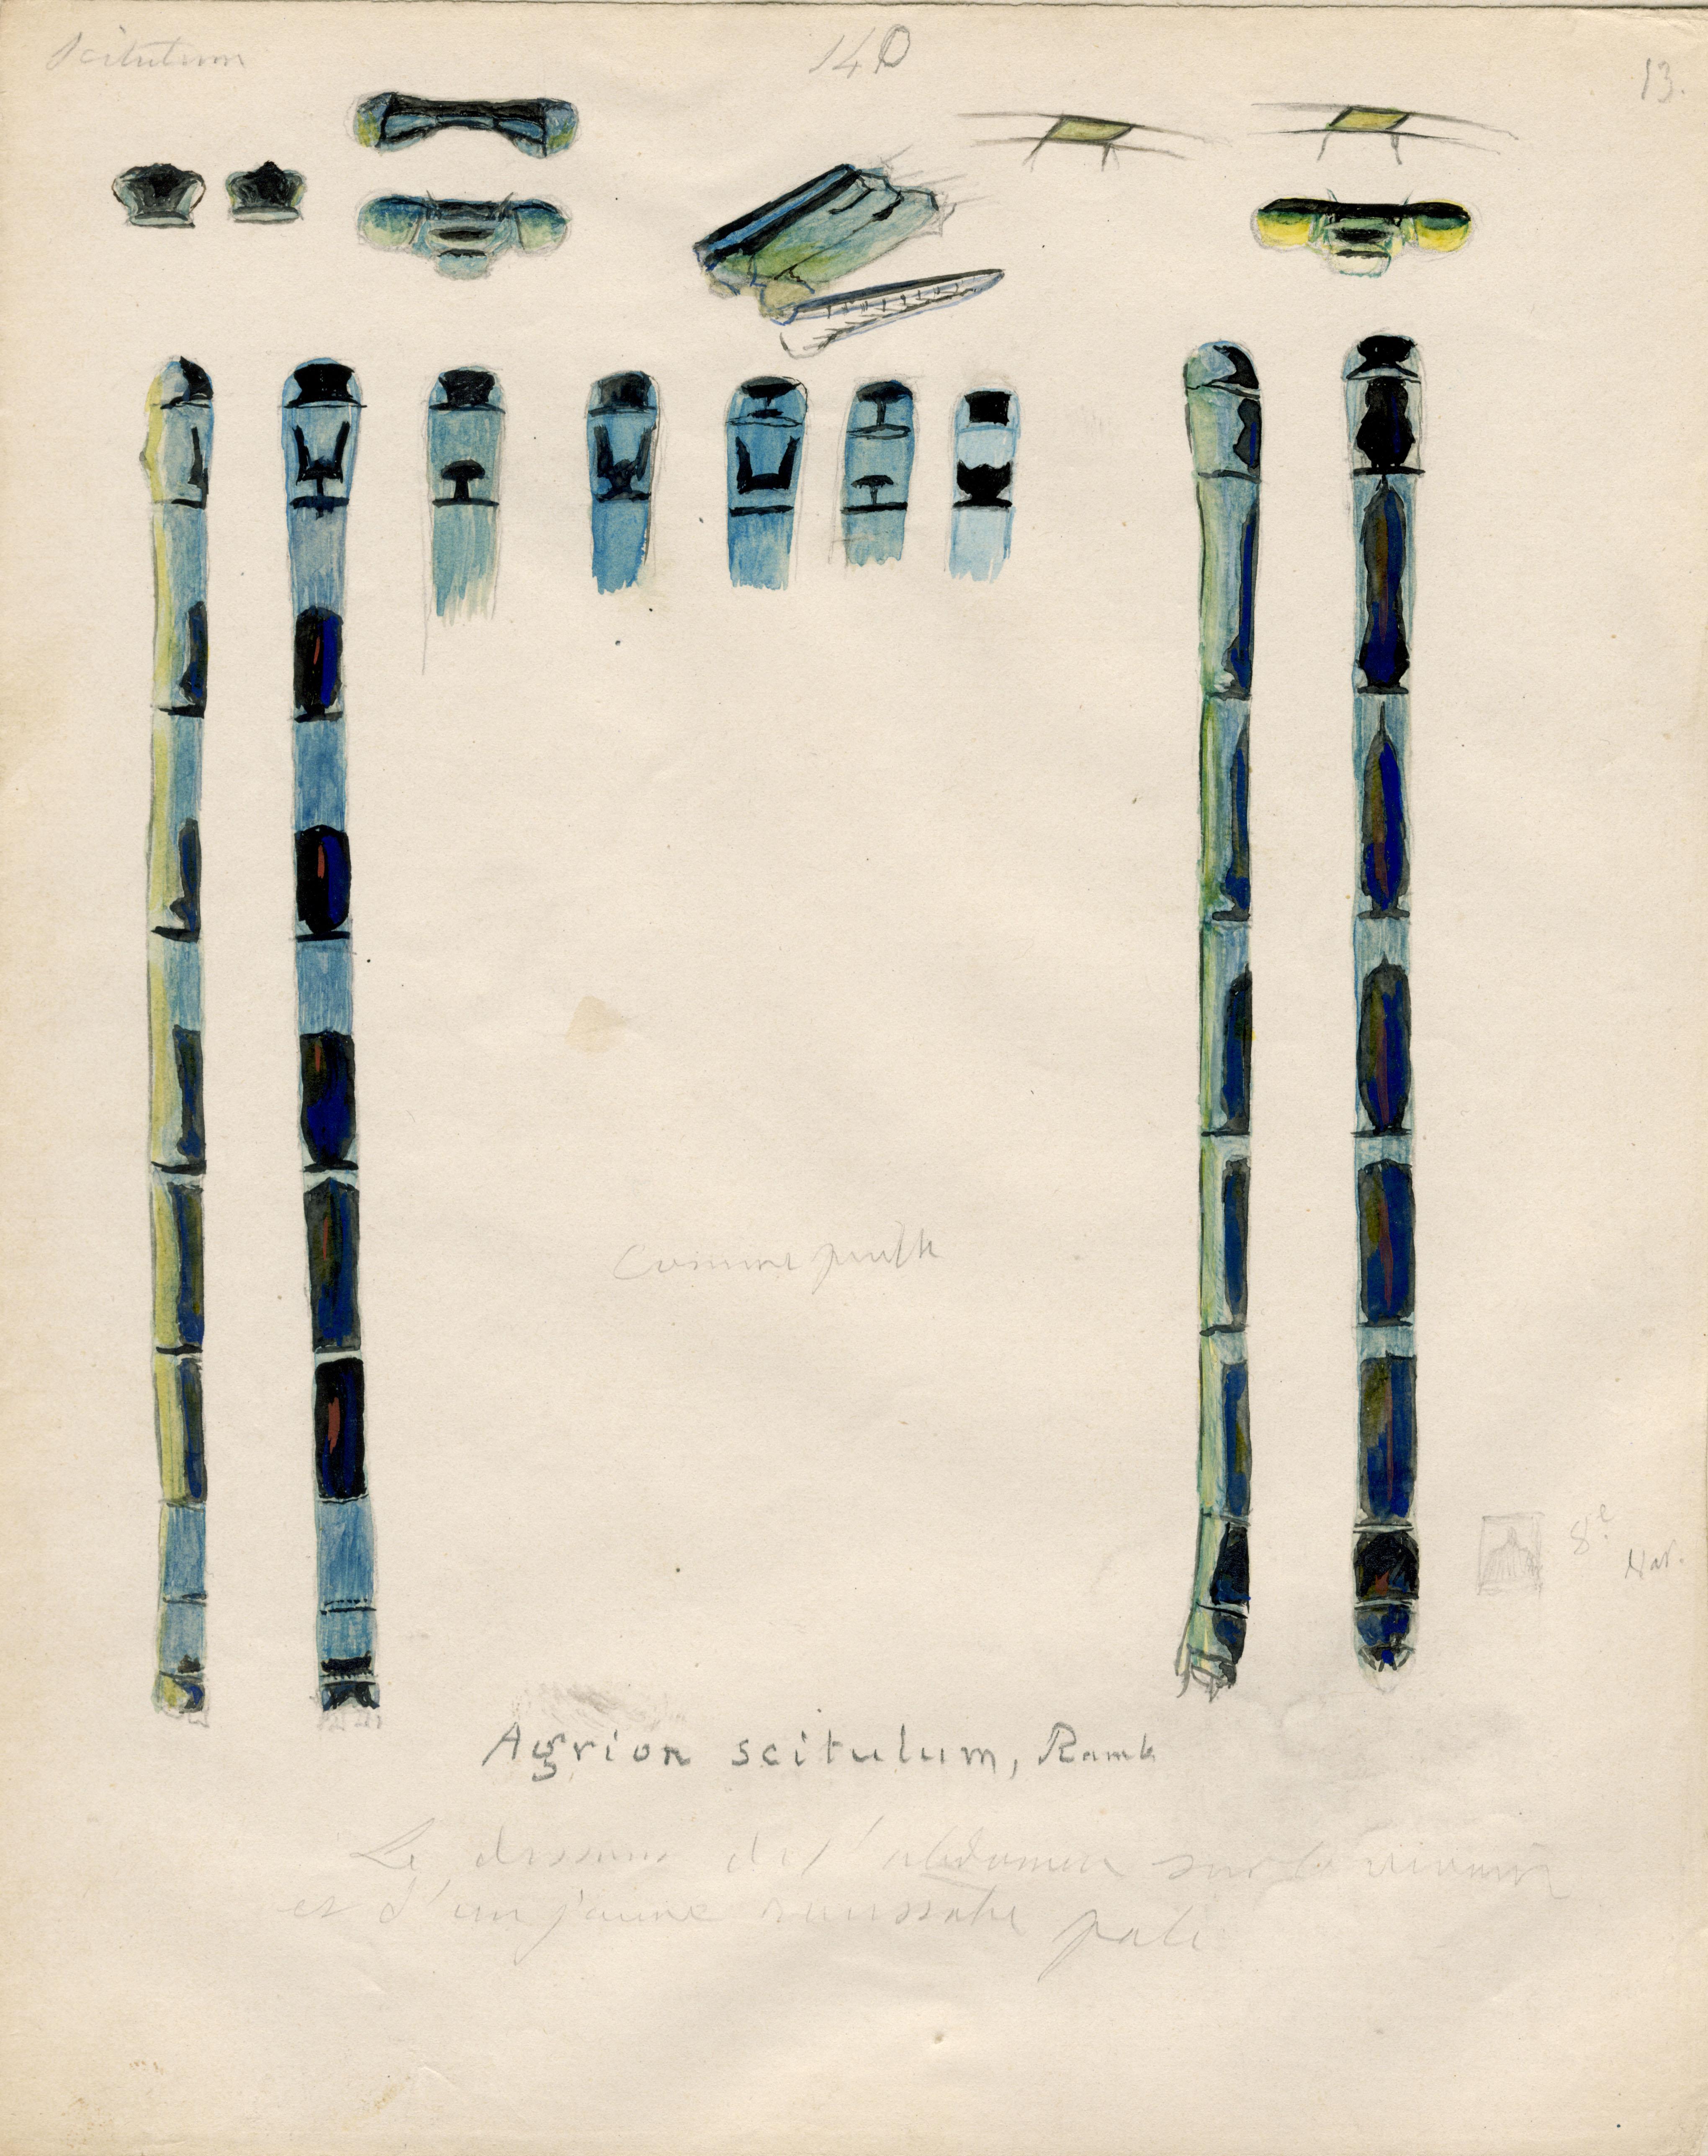 Agrion scitulum.jpg